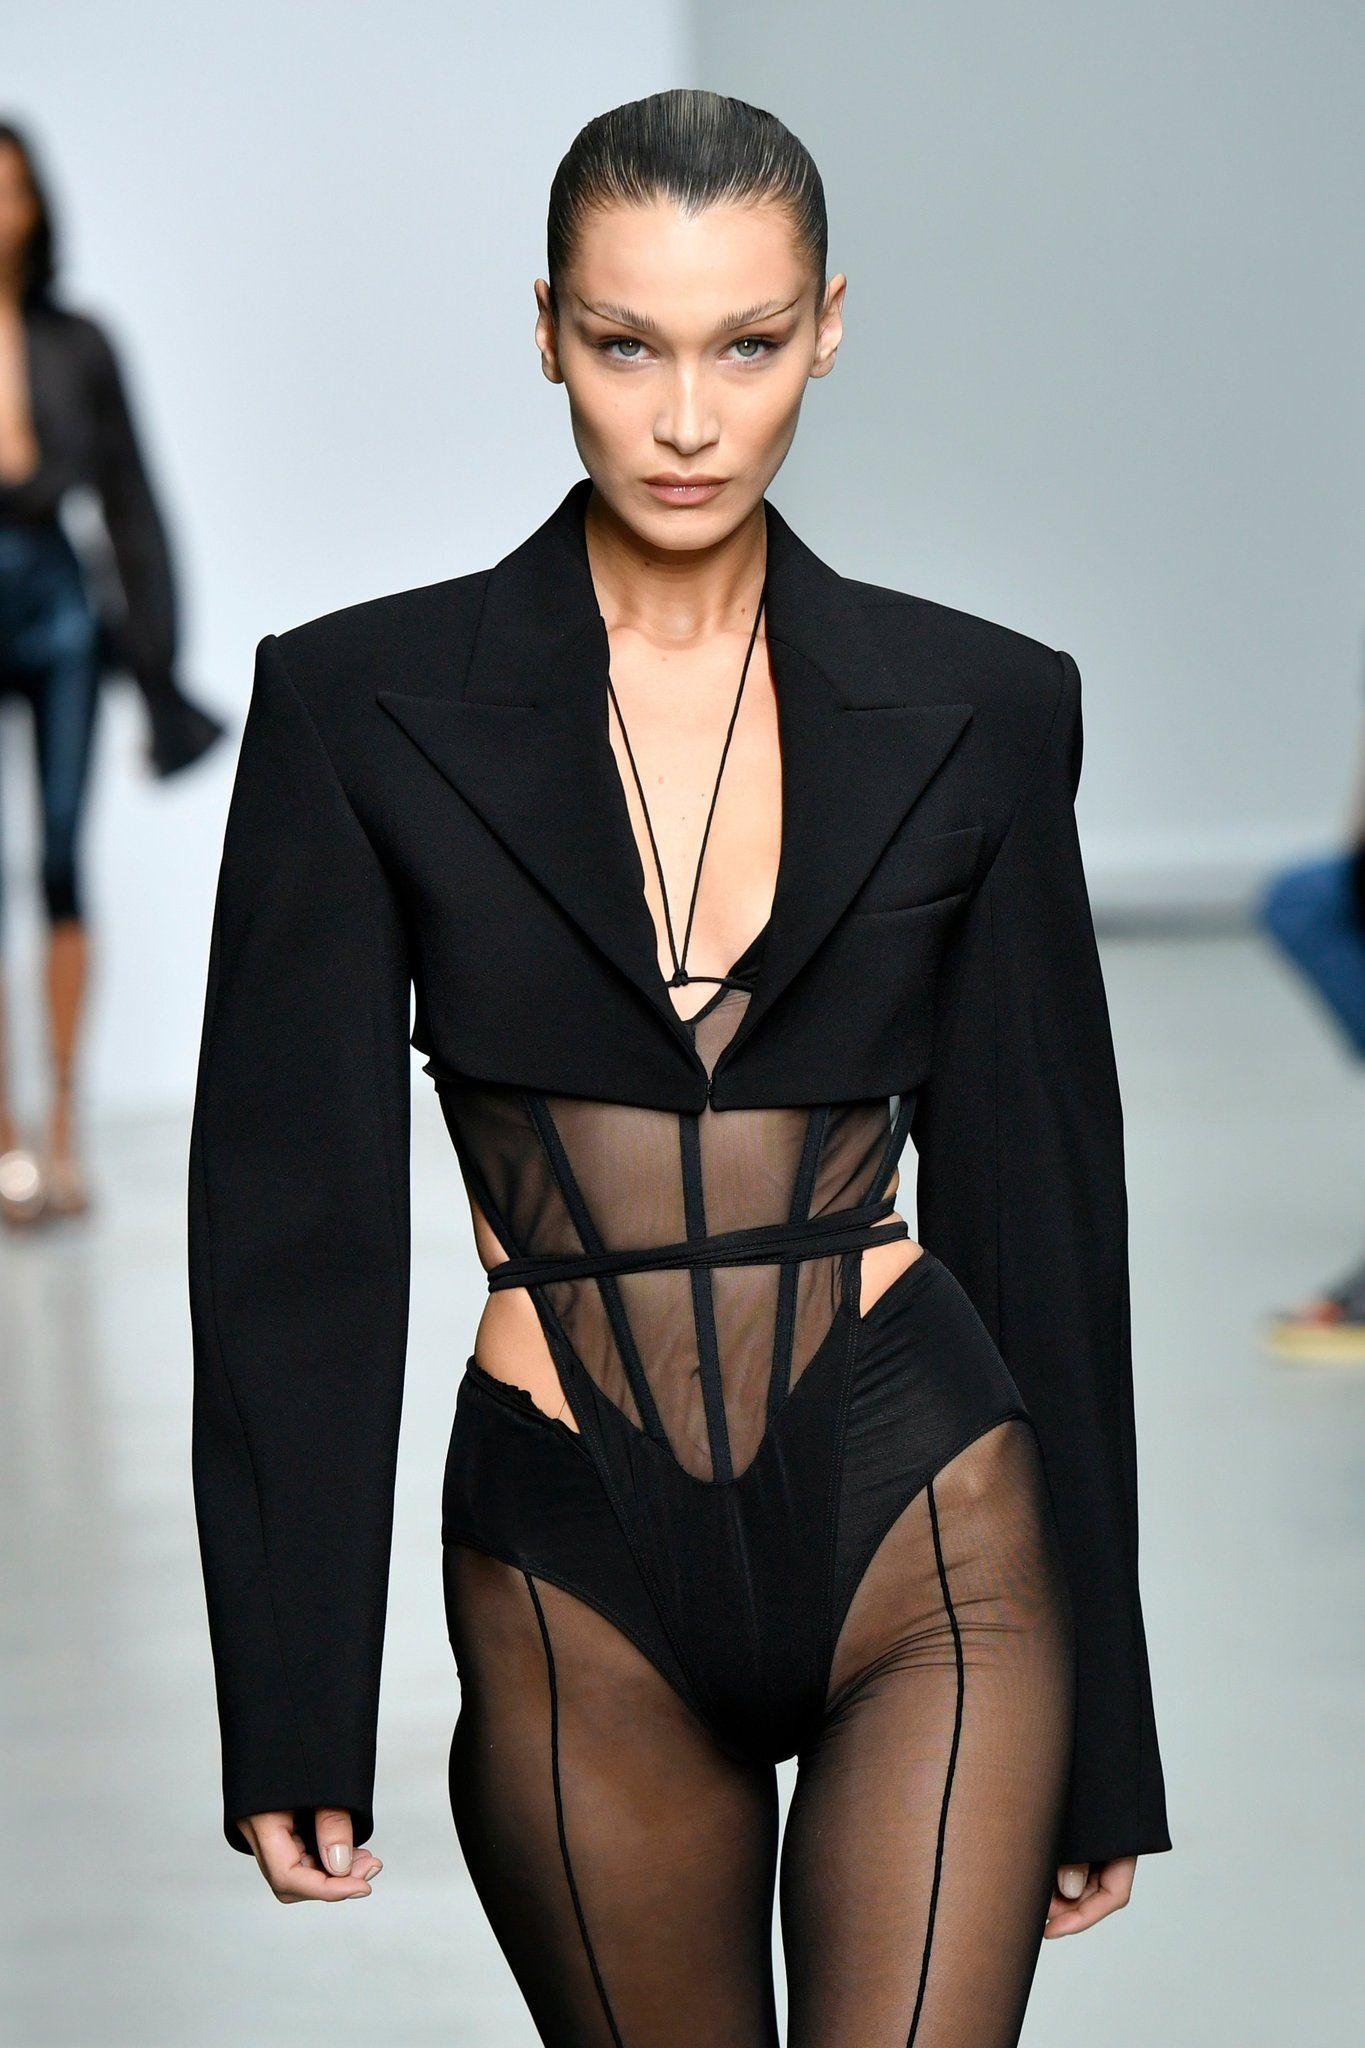 Bella Hadid News on Twitter   Paris fashion week 2019, Fashion week, Fashion